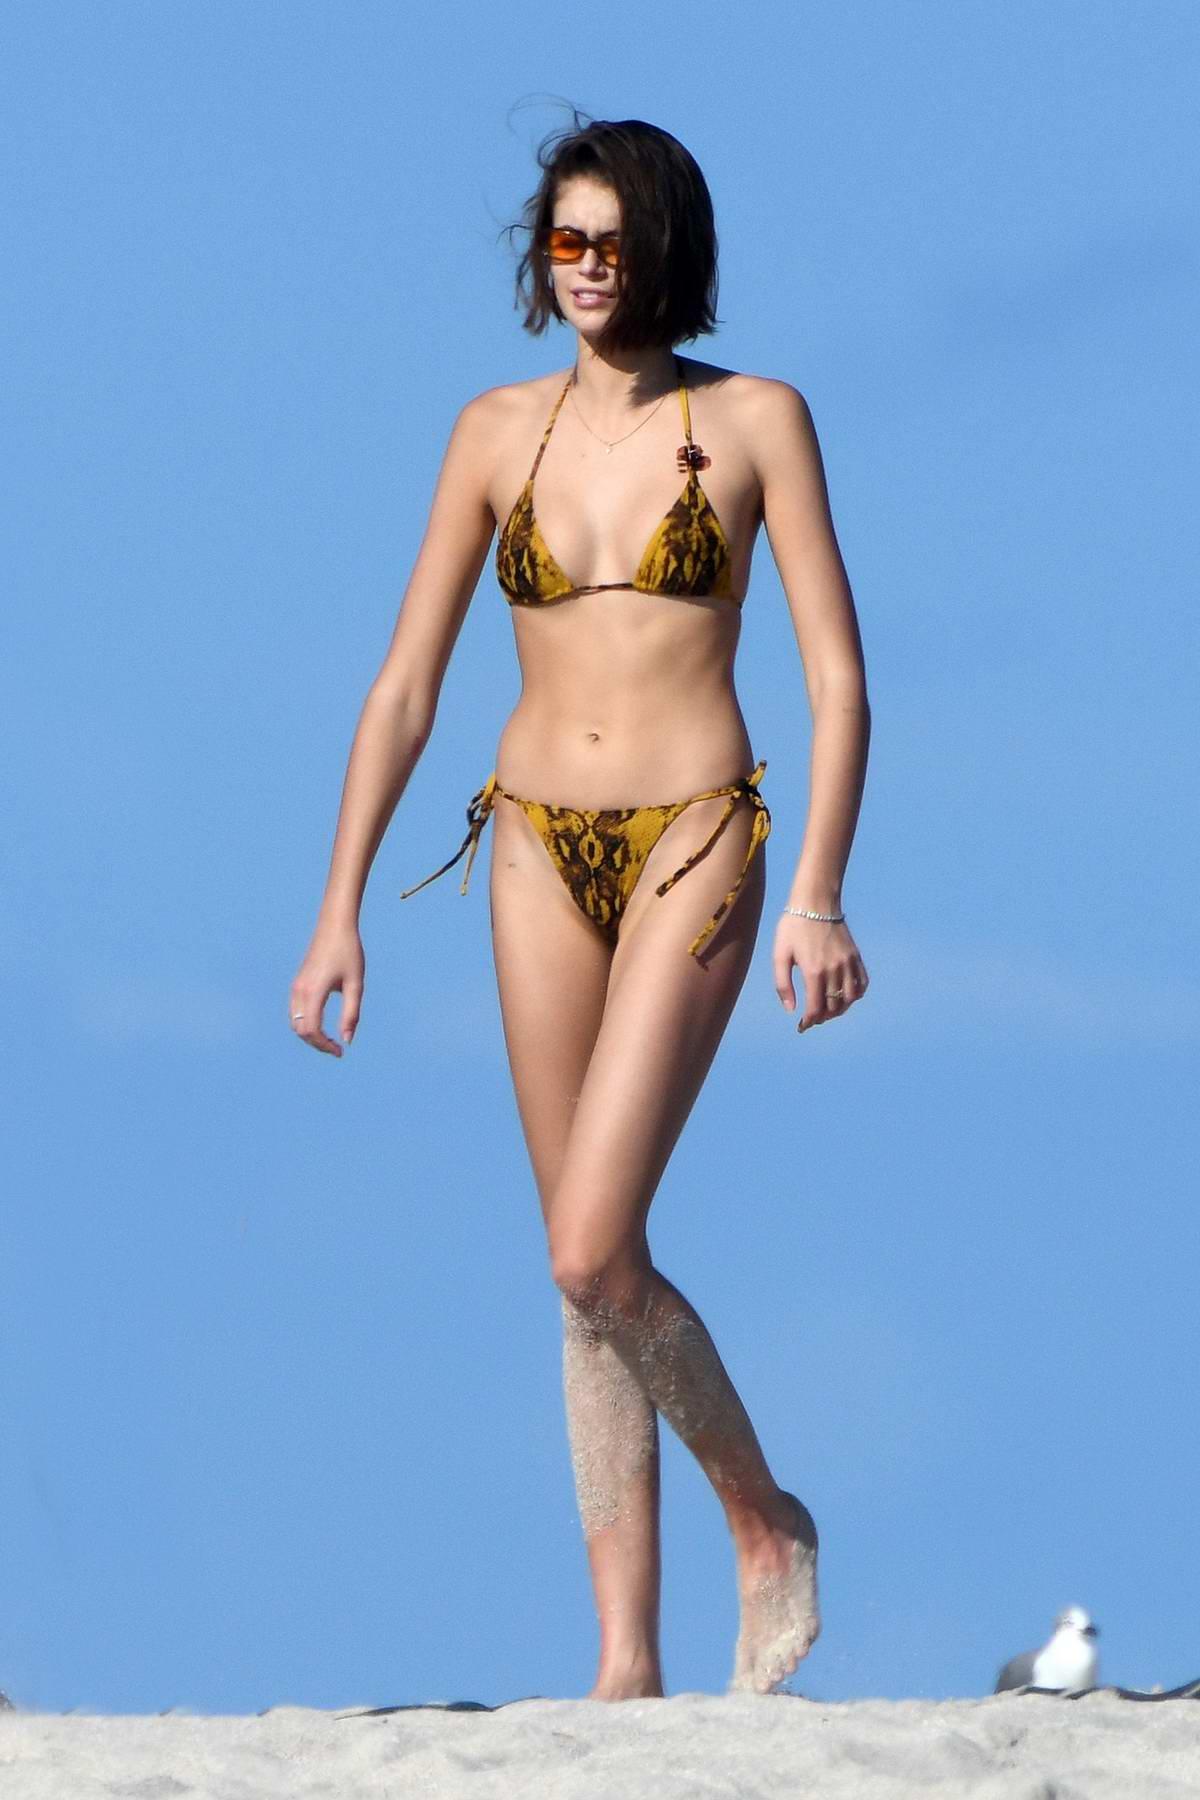 Kaia Gerber in Bikini - Social Media Pics - GotCeleb